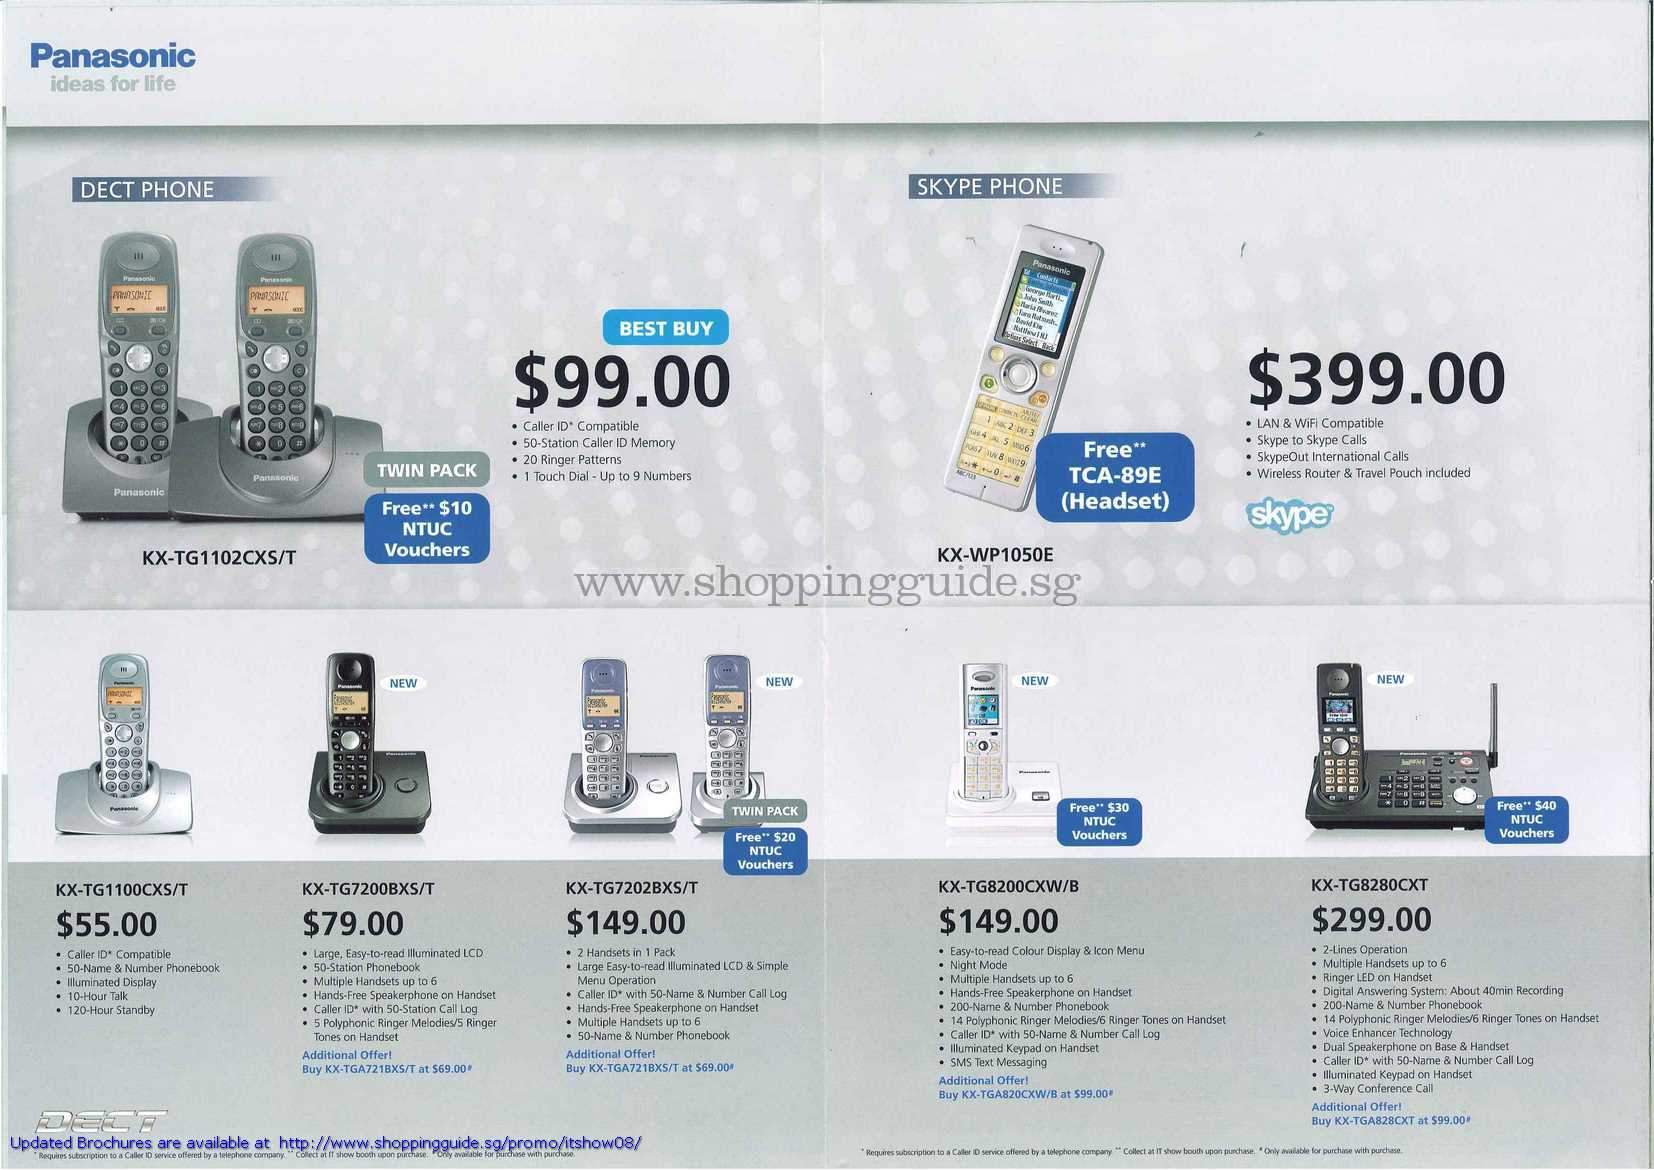 IT Show 2008 price list image brochure of Panasonic Dect Phones Skype Phone KX